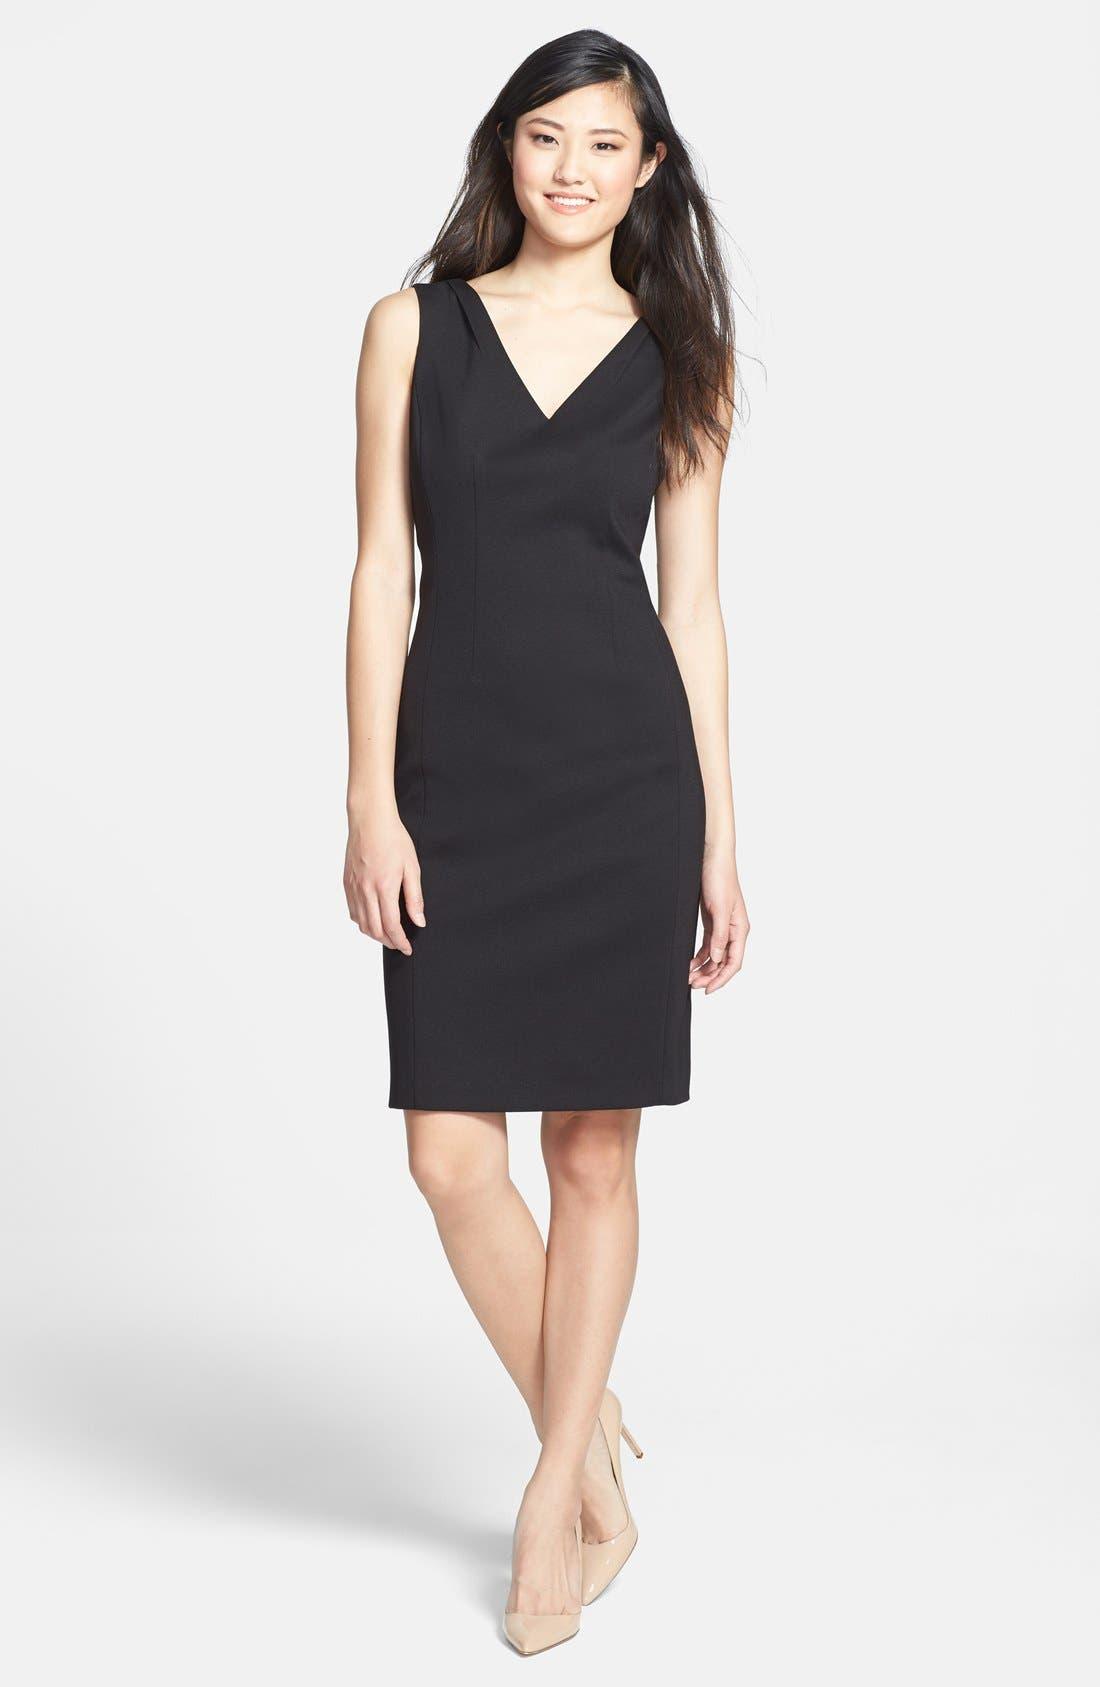 Alternate Image 1 Selected - T Tahari 'Everly' V-Neck Sheath Dress